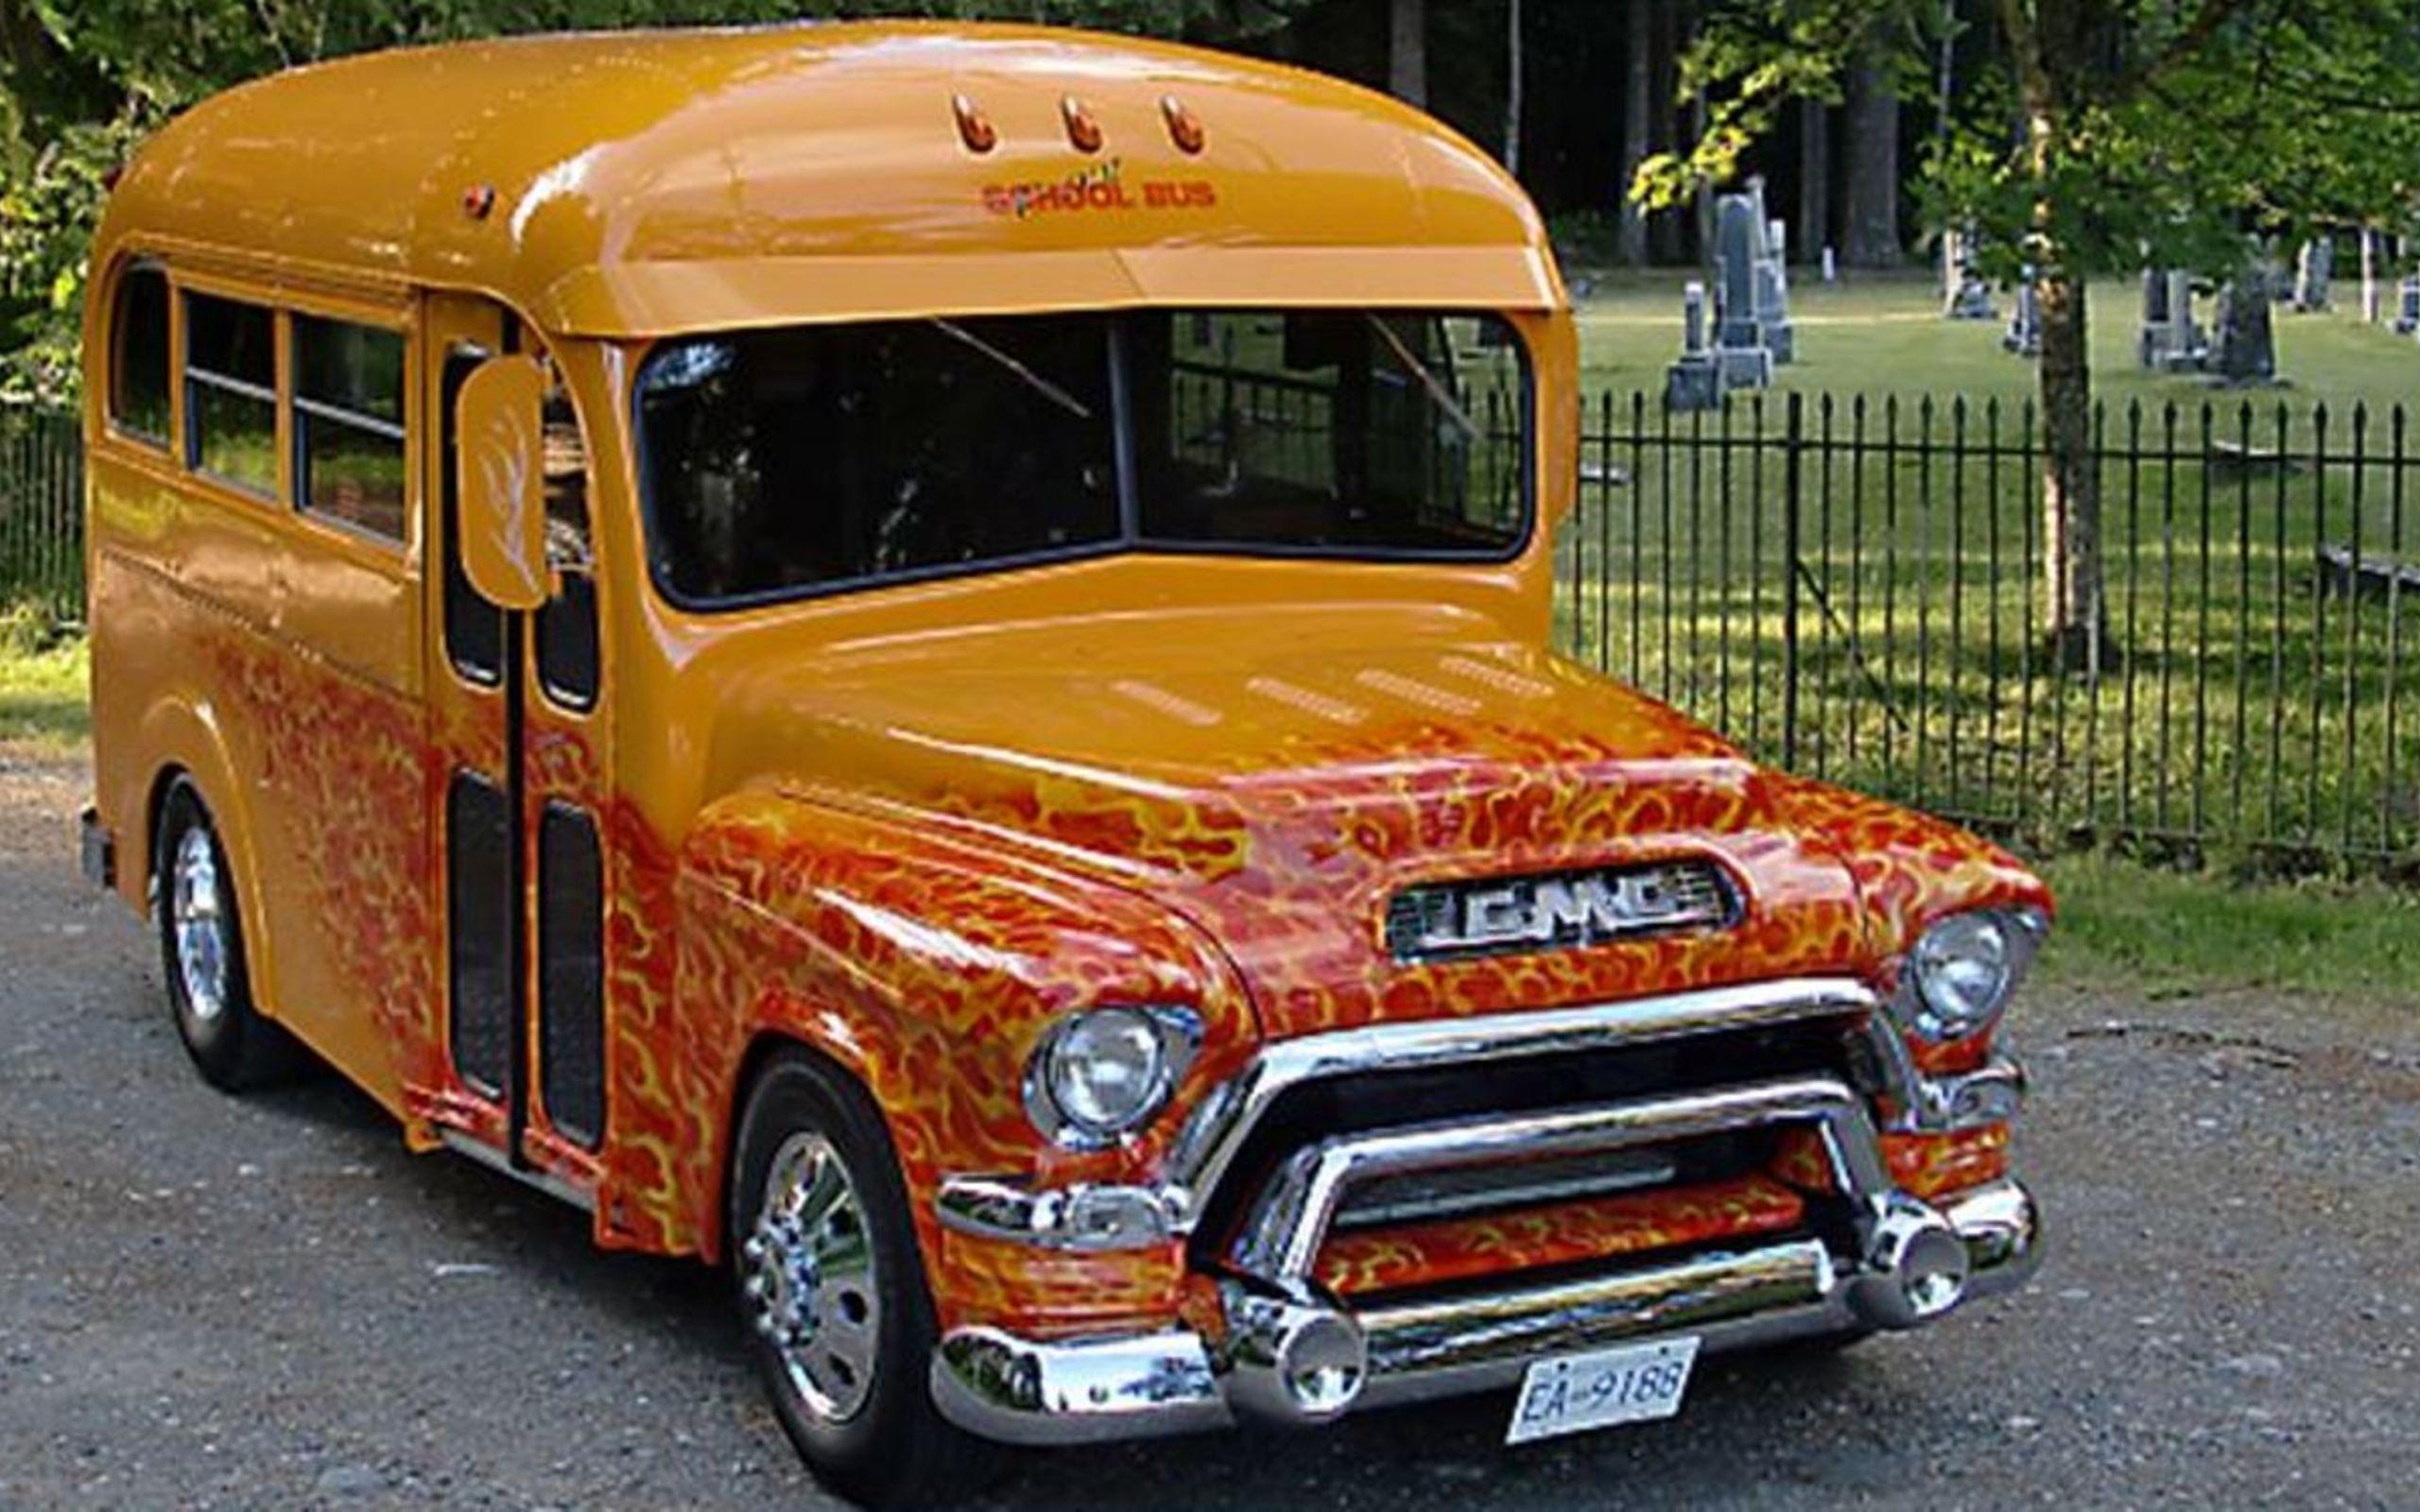 06_RV-BC-School-Bus-Custom.JPG 2,560×1,600 pixels | Magic Bus ...